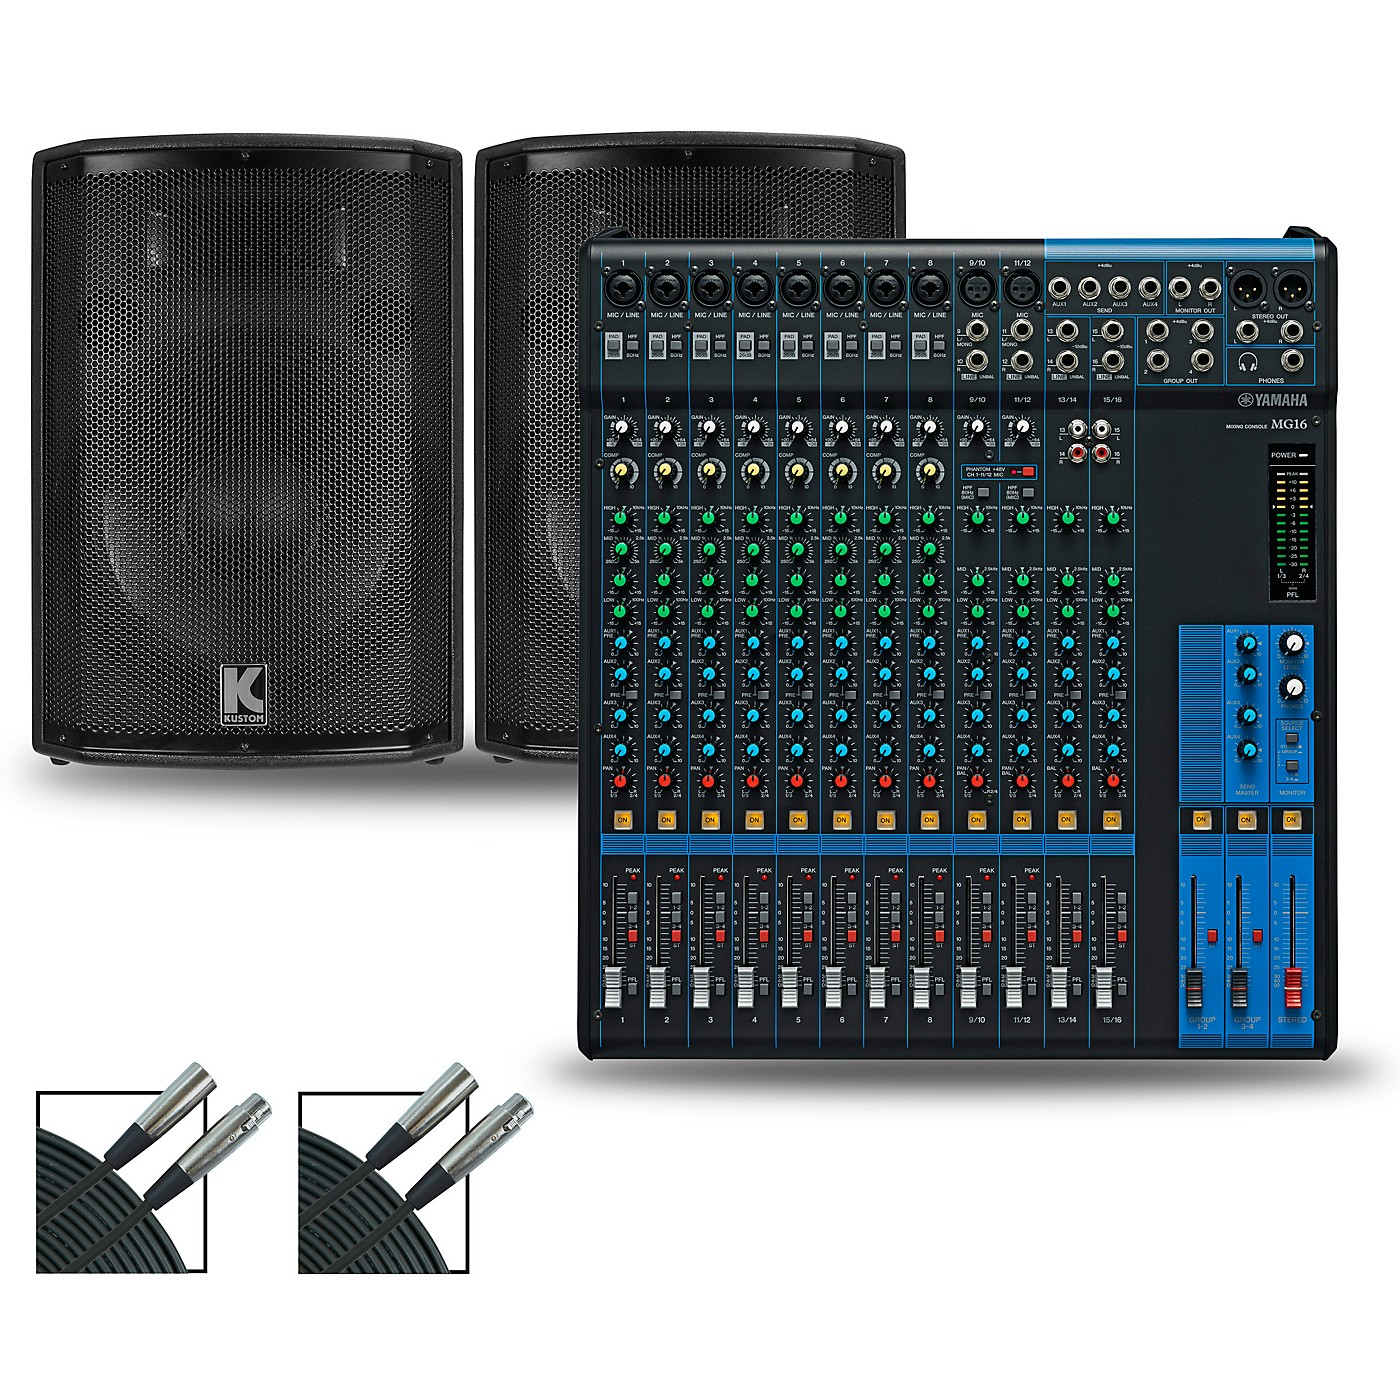 Yamaha MG16XU Mixer and Kustom HiPAC Speakers thumbnail